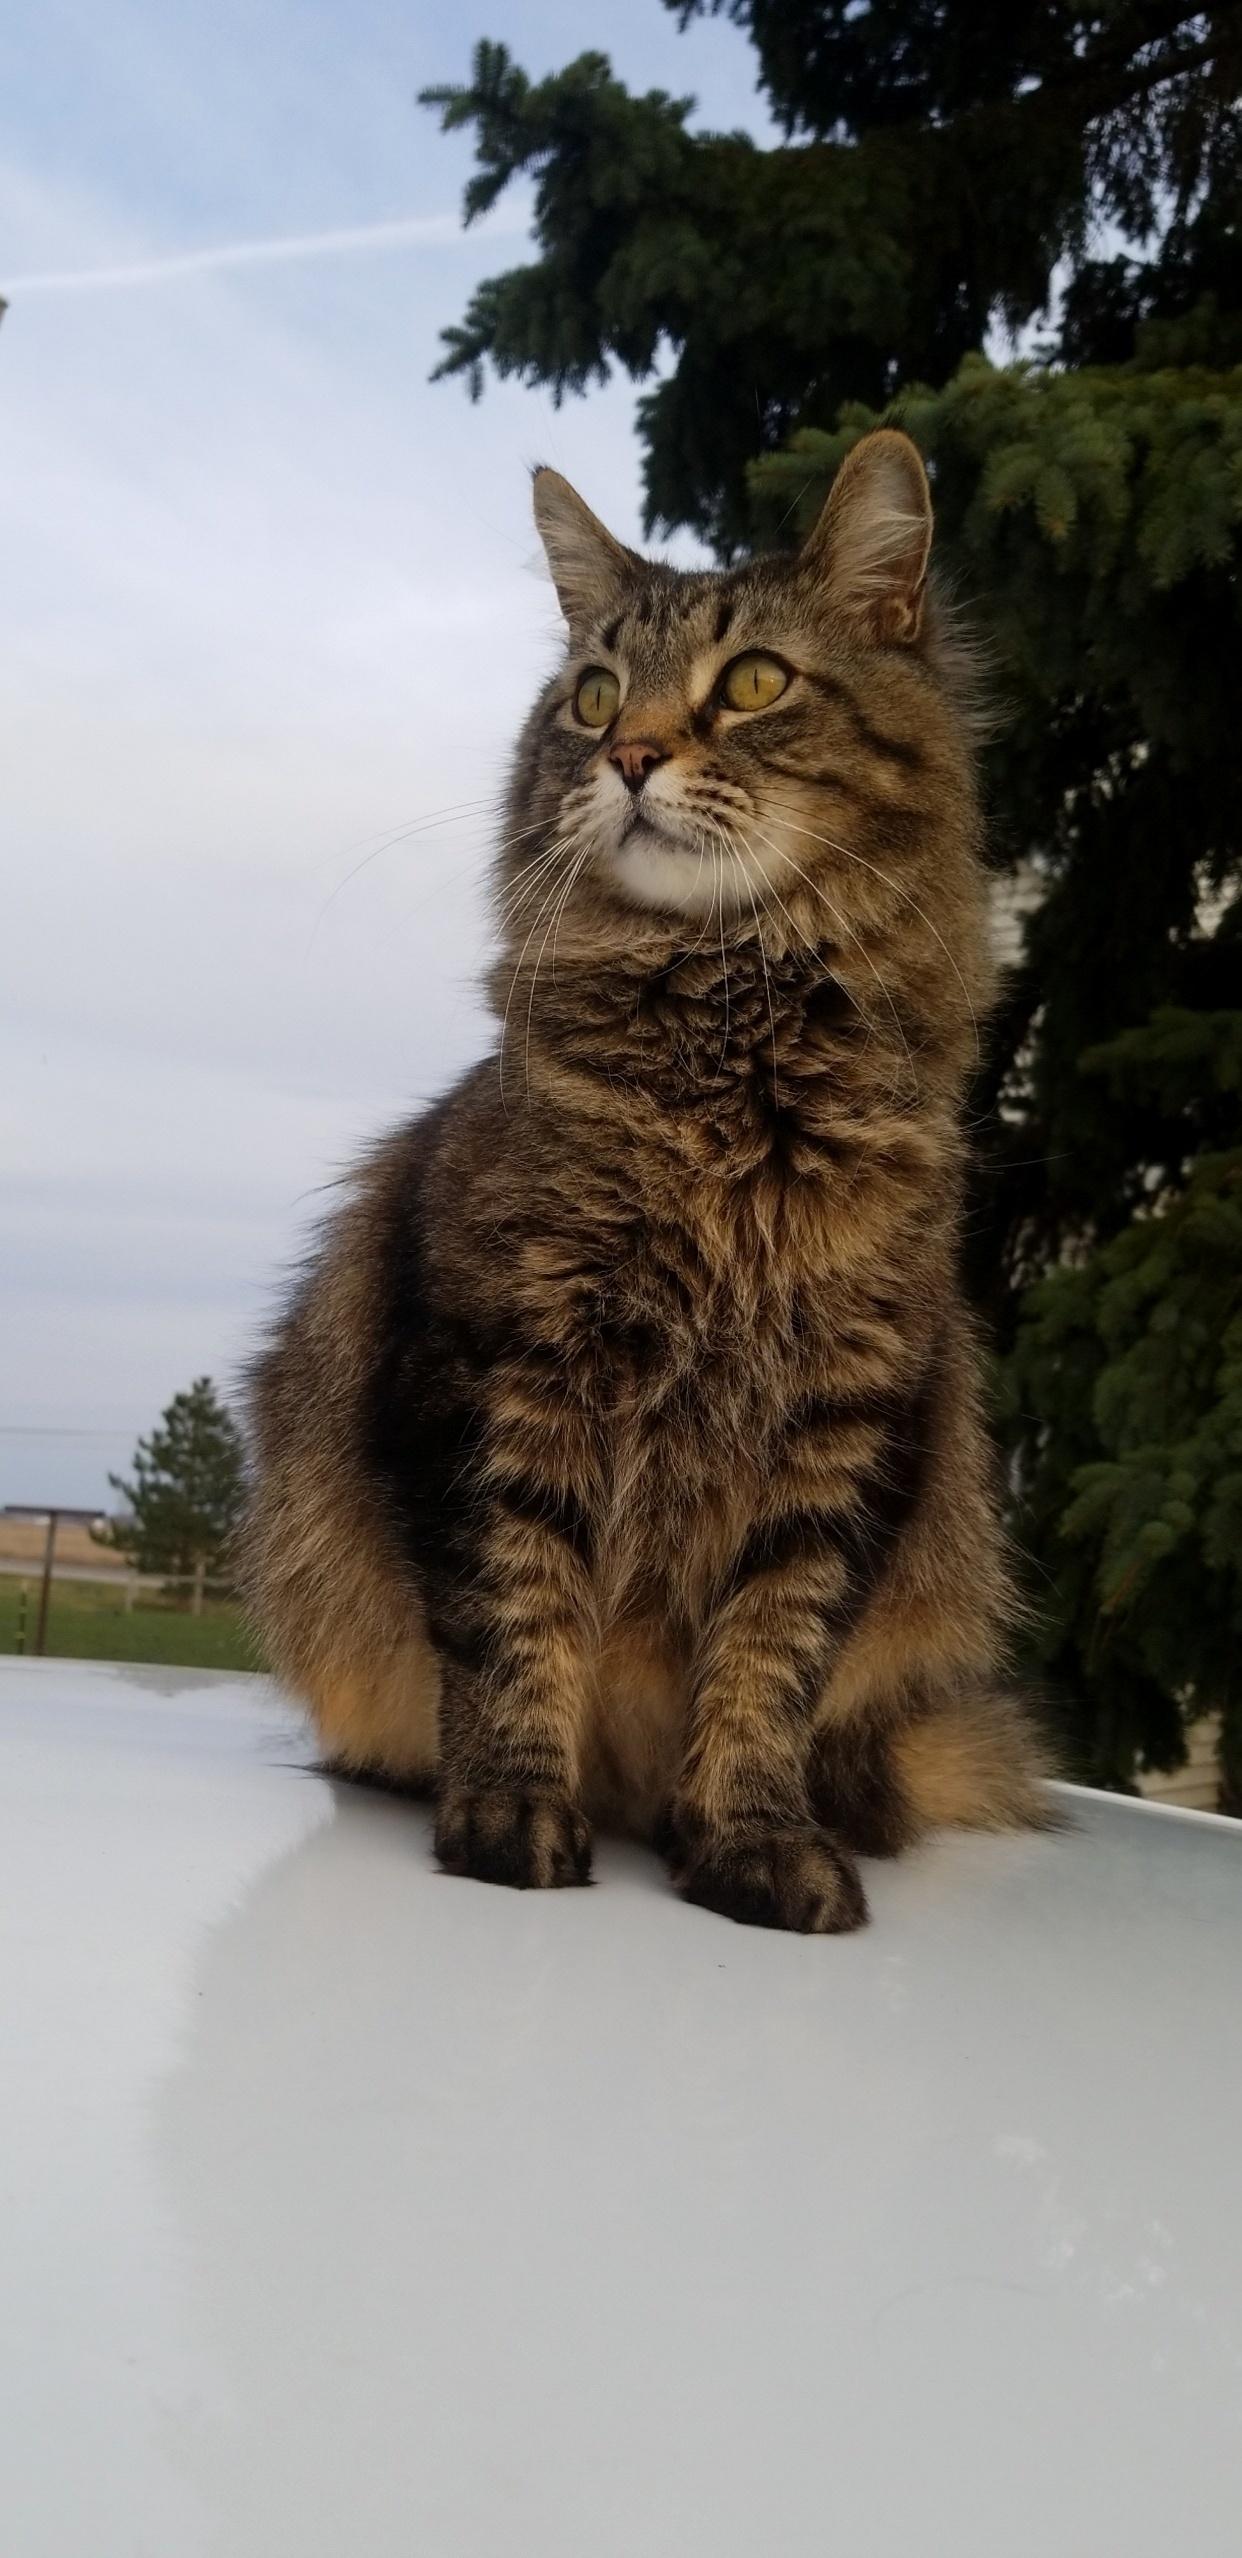 Overlooking his kingdom.